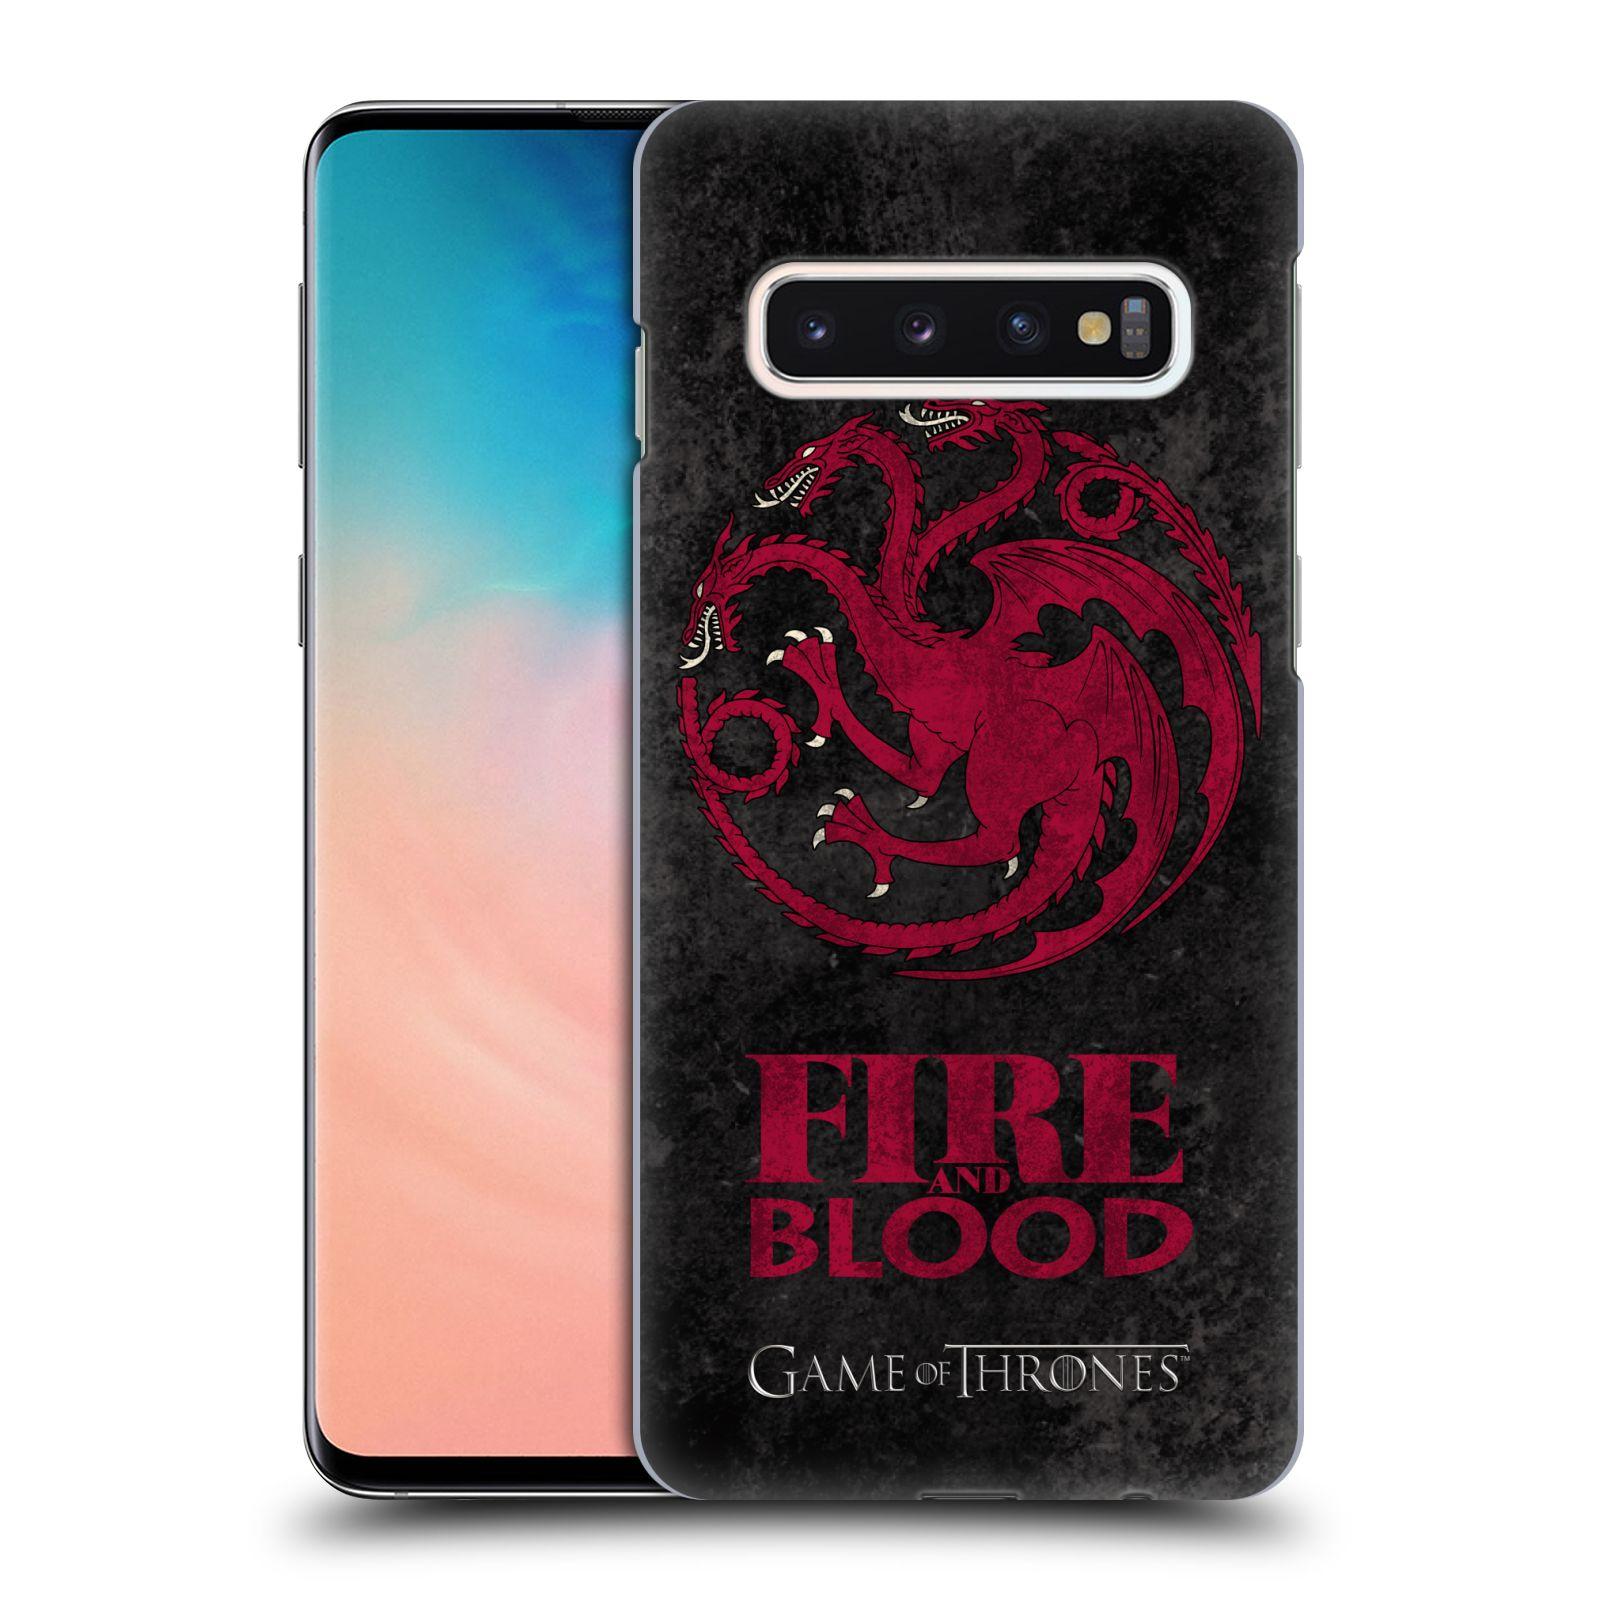 Plastové pouzdro na mobil Samsung Galaxy S10 - Head Case - Hra o trůny - Sigils Targaryen - Fire and Blood